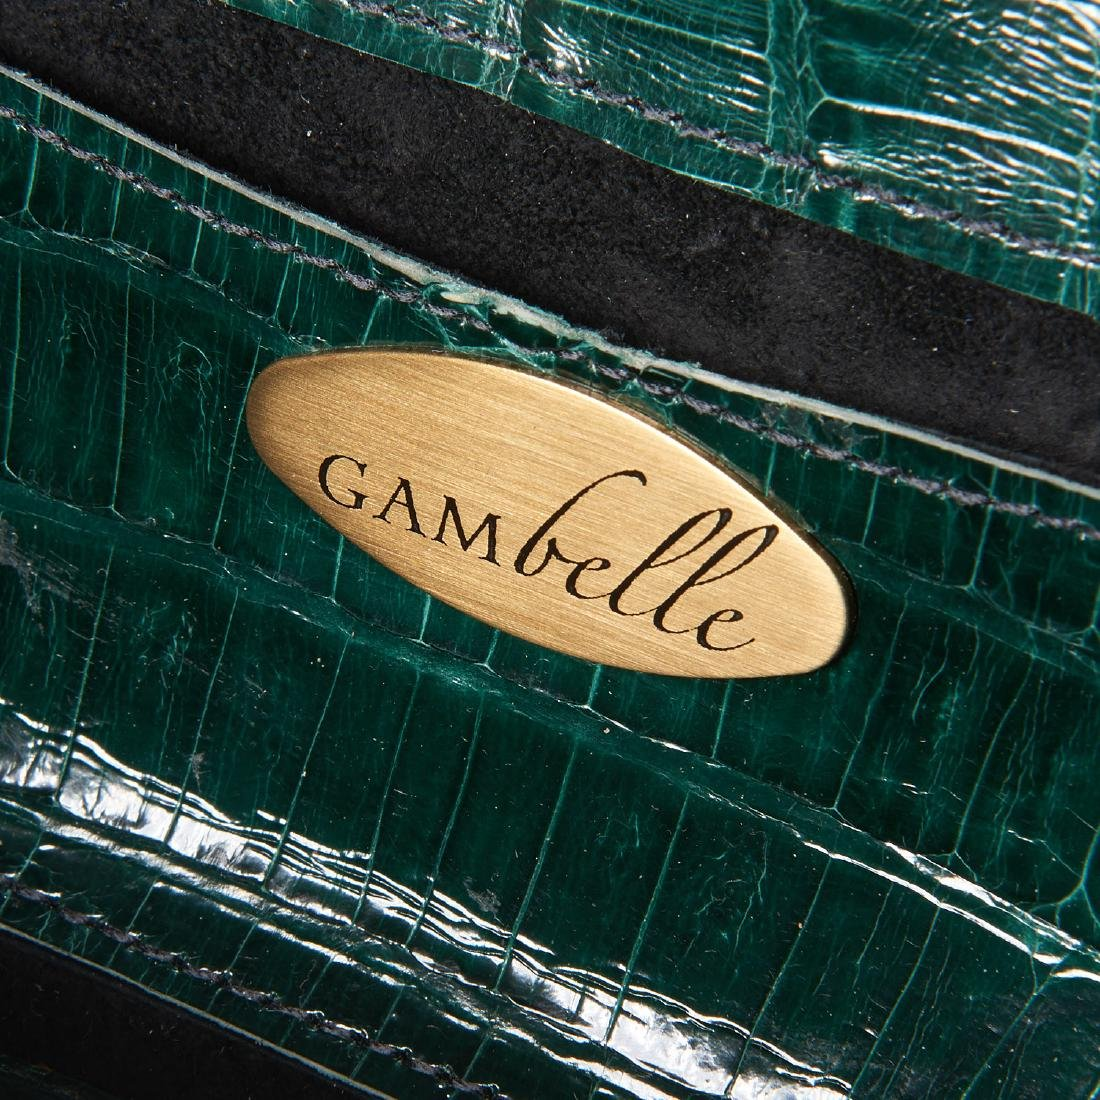 Gambelle green glazed crocodile clutch handbag - 6